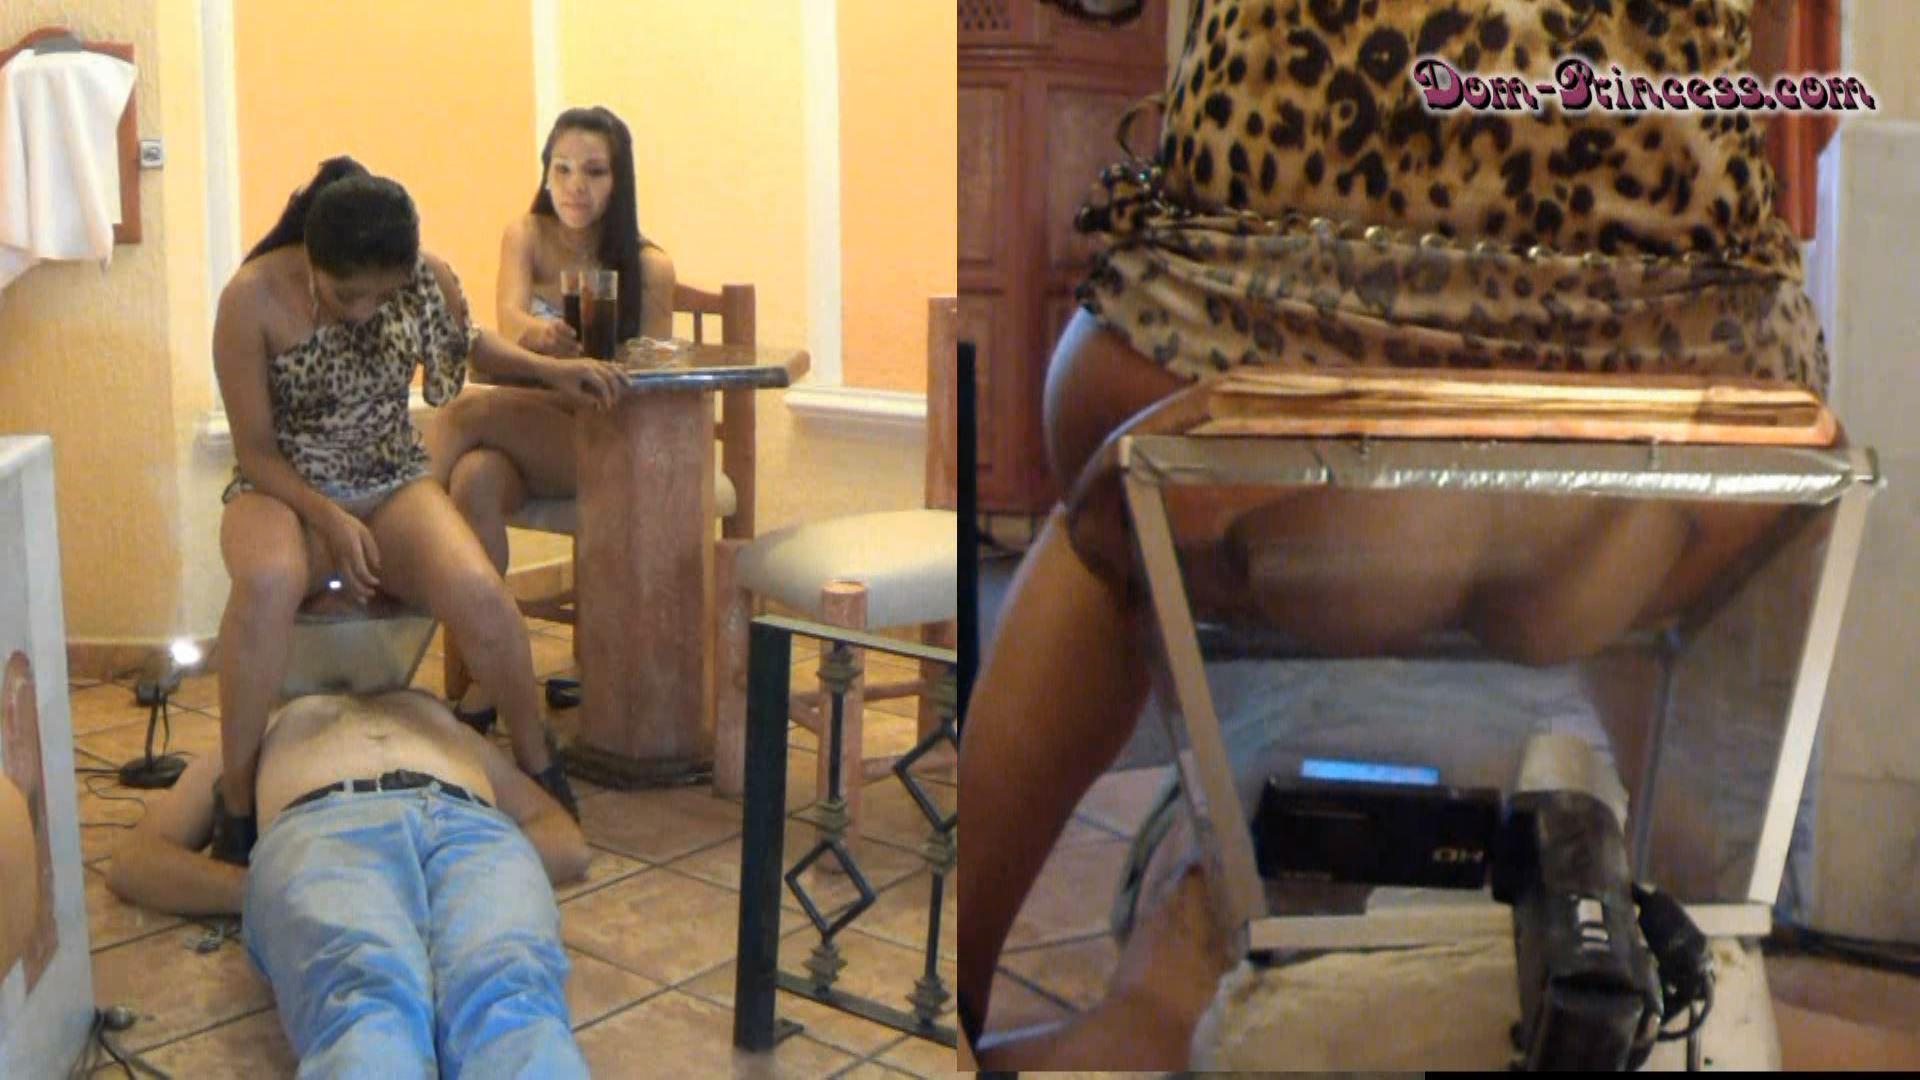 [SCAT-PRINCESS] Stone Mask   Showcase   Girl Part 13 Gabi [FULL HD][1080p][WMV]